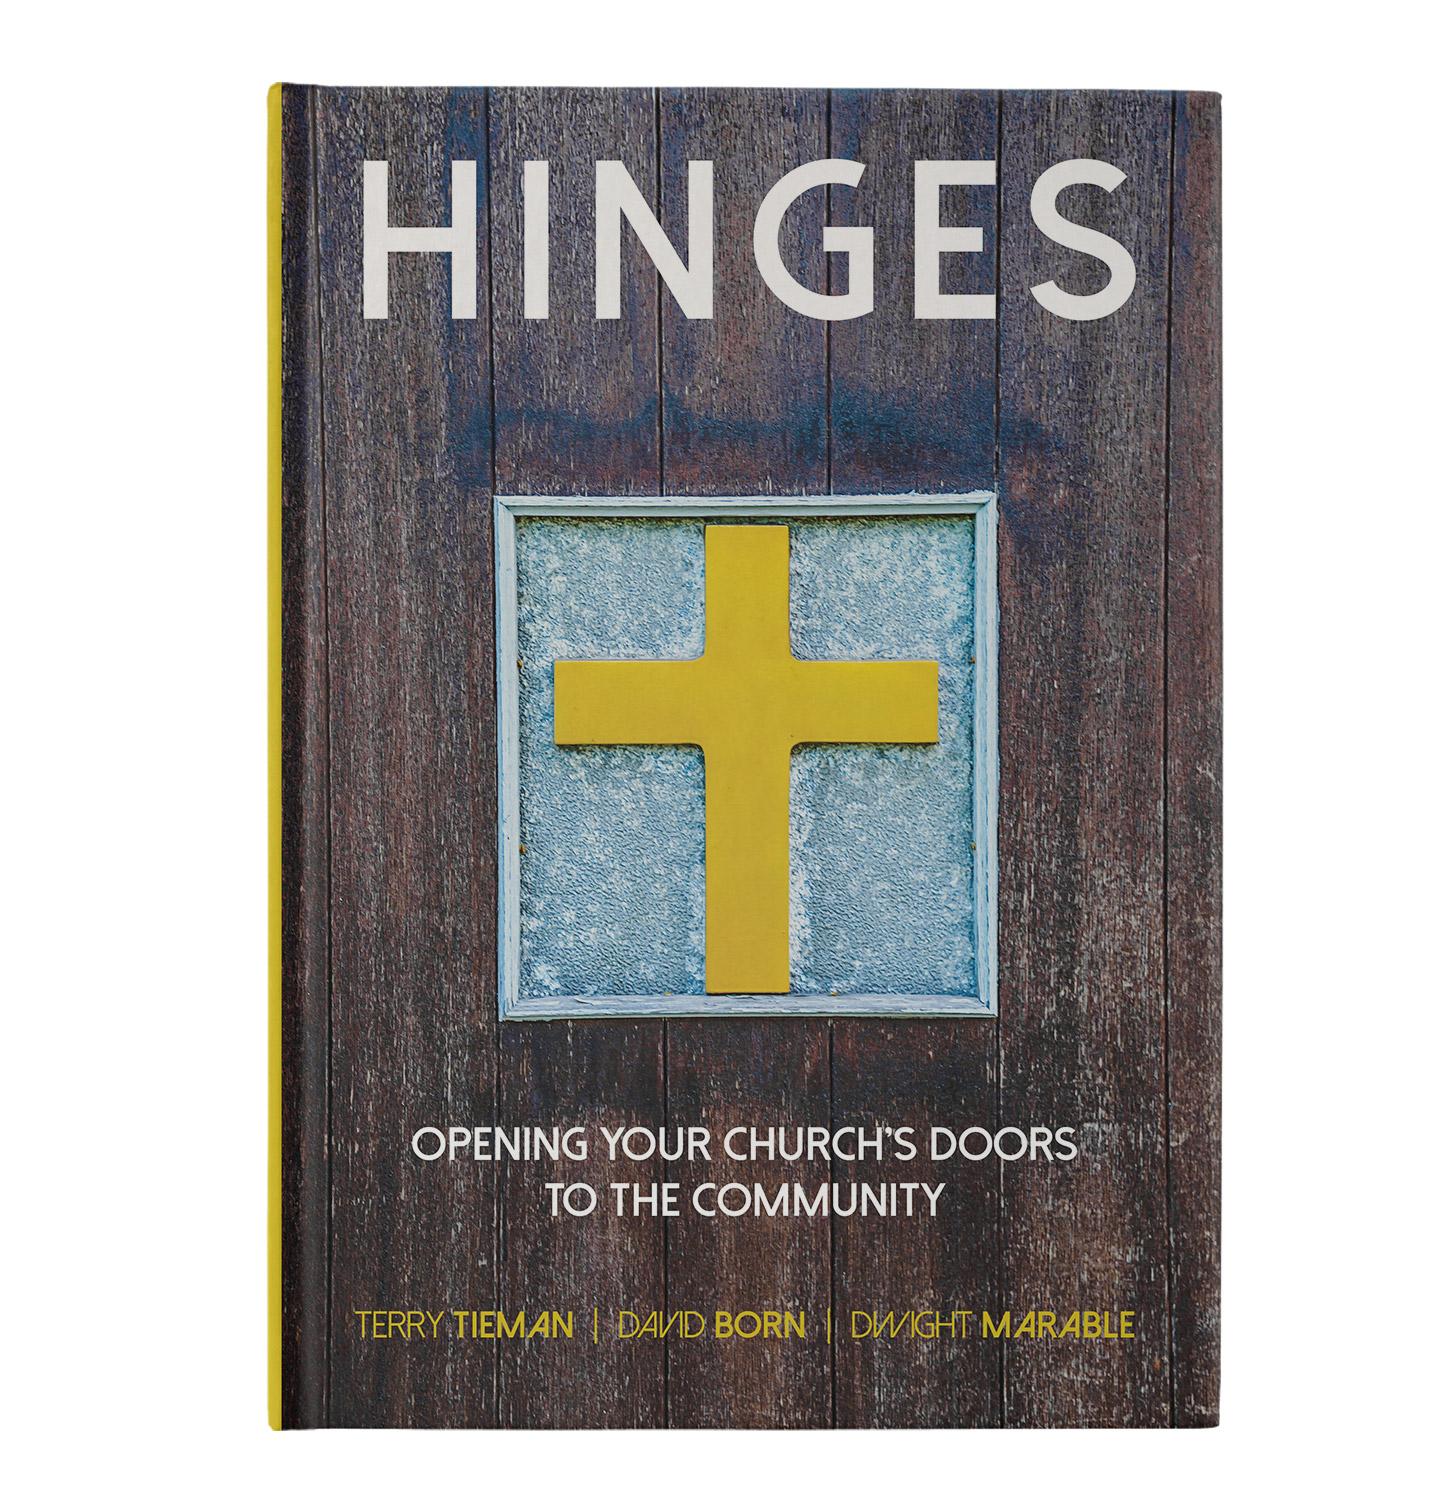 hinges-book-cover.jpg